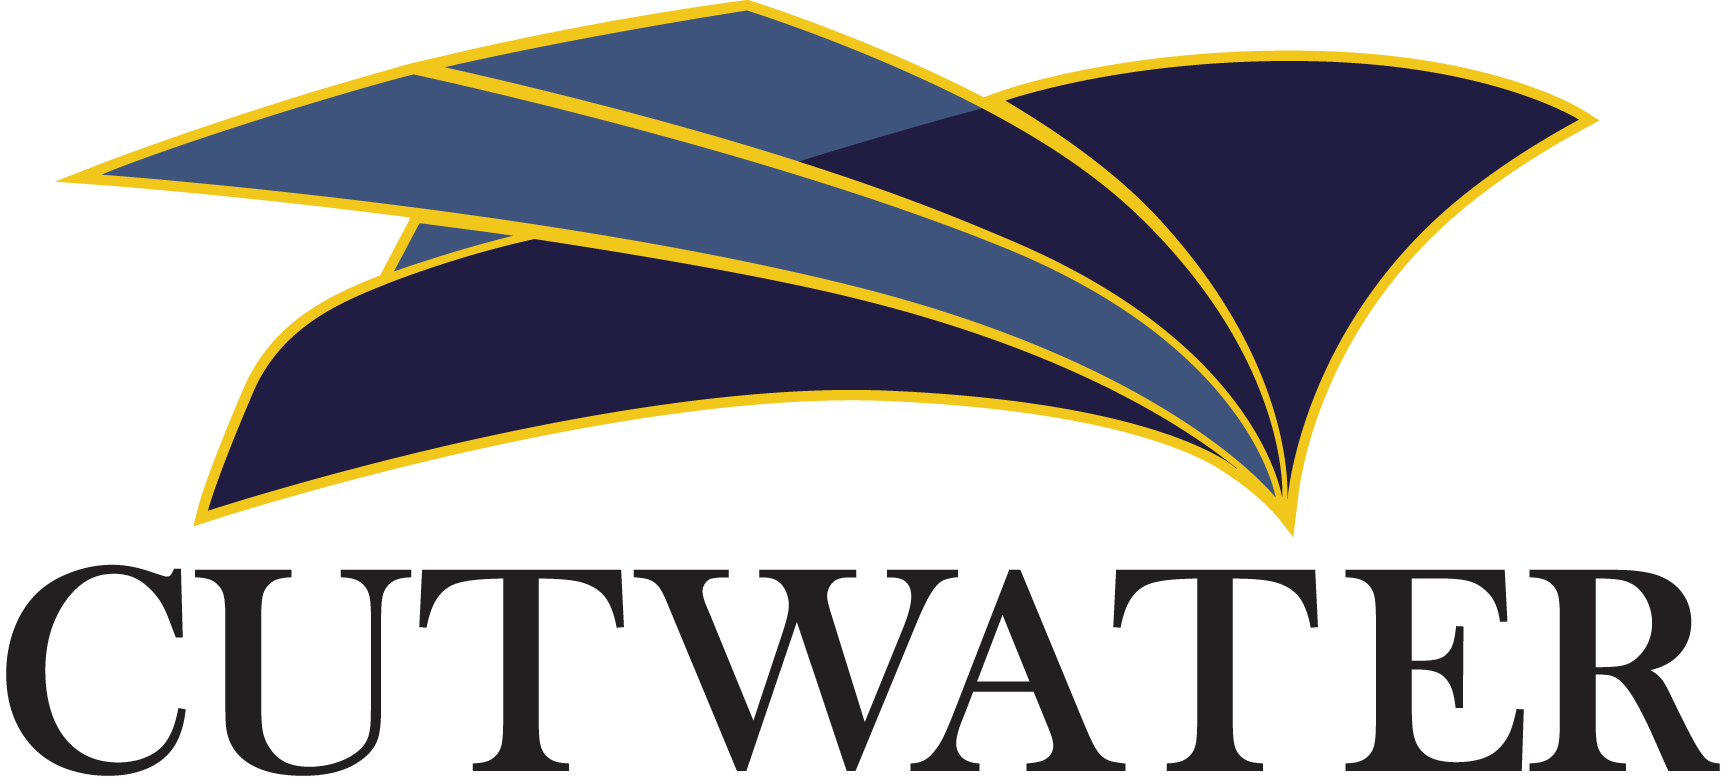 Cutwater brand logo